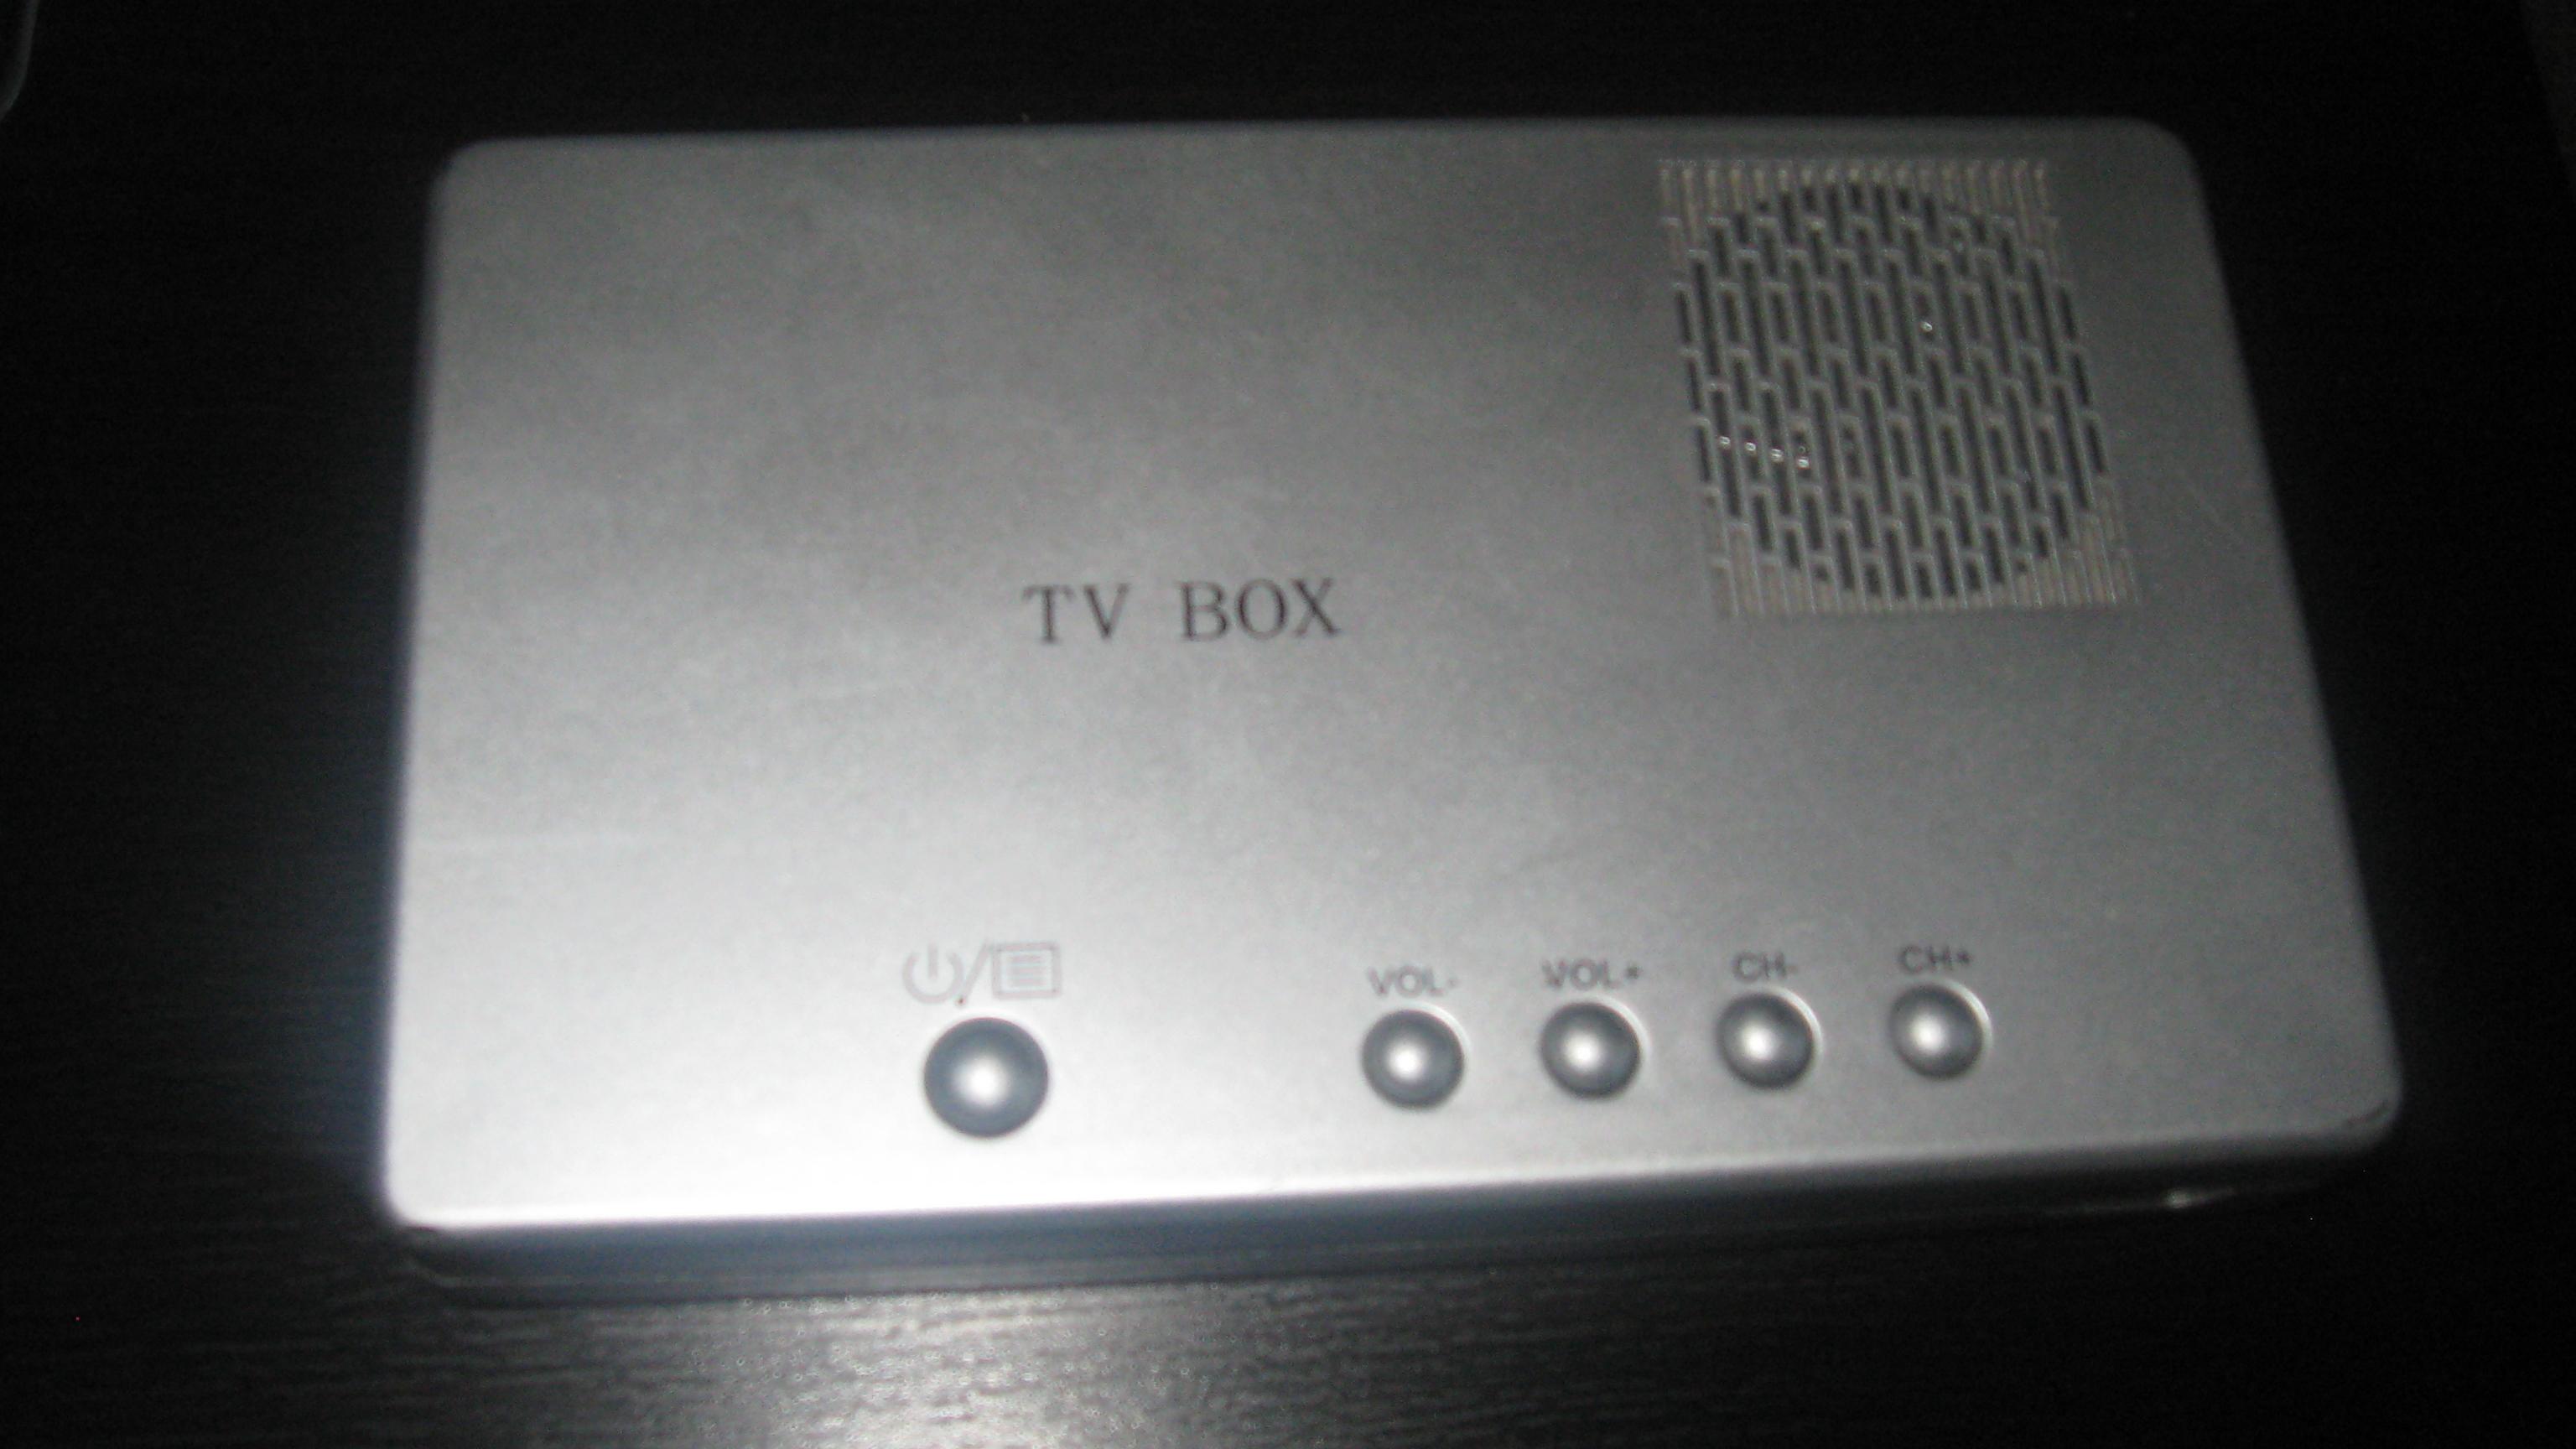 [Sprzedam] Adapter TV-->VGA TV BOX, TANIO! Pod��cz DVR bez VGA do monitora LC